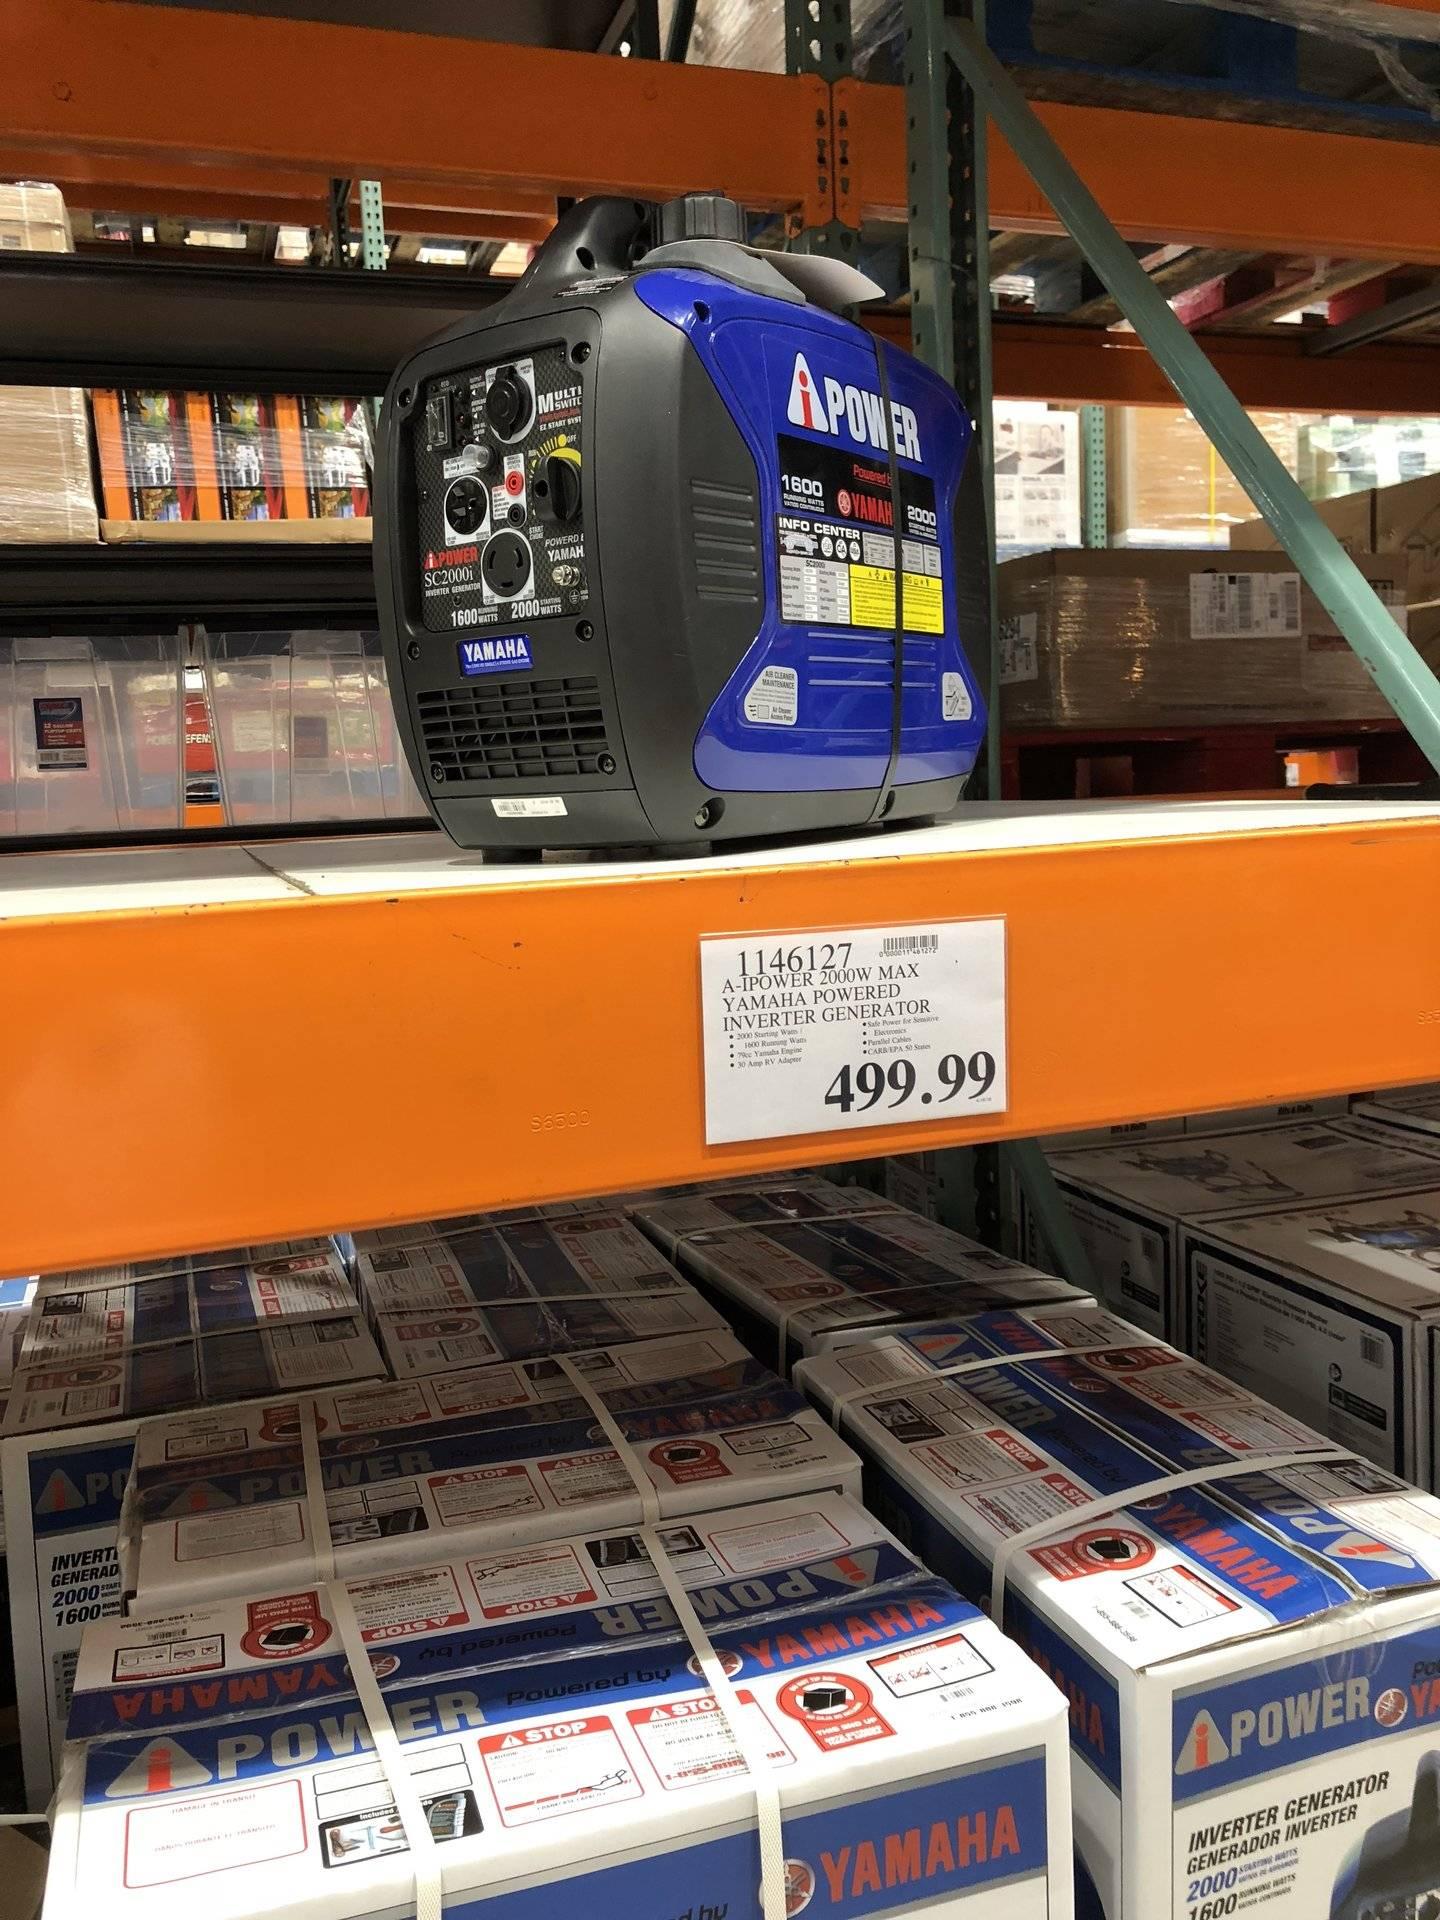 for sale costco generator bloodydecks Costco Honeywell 17 kW Generator for sale costco generator